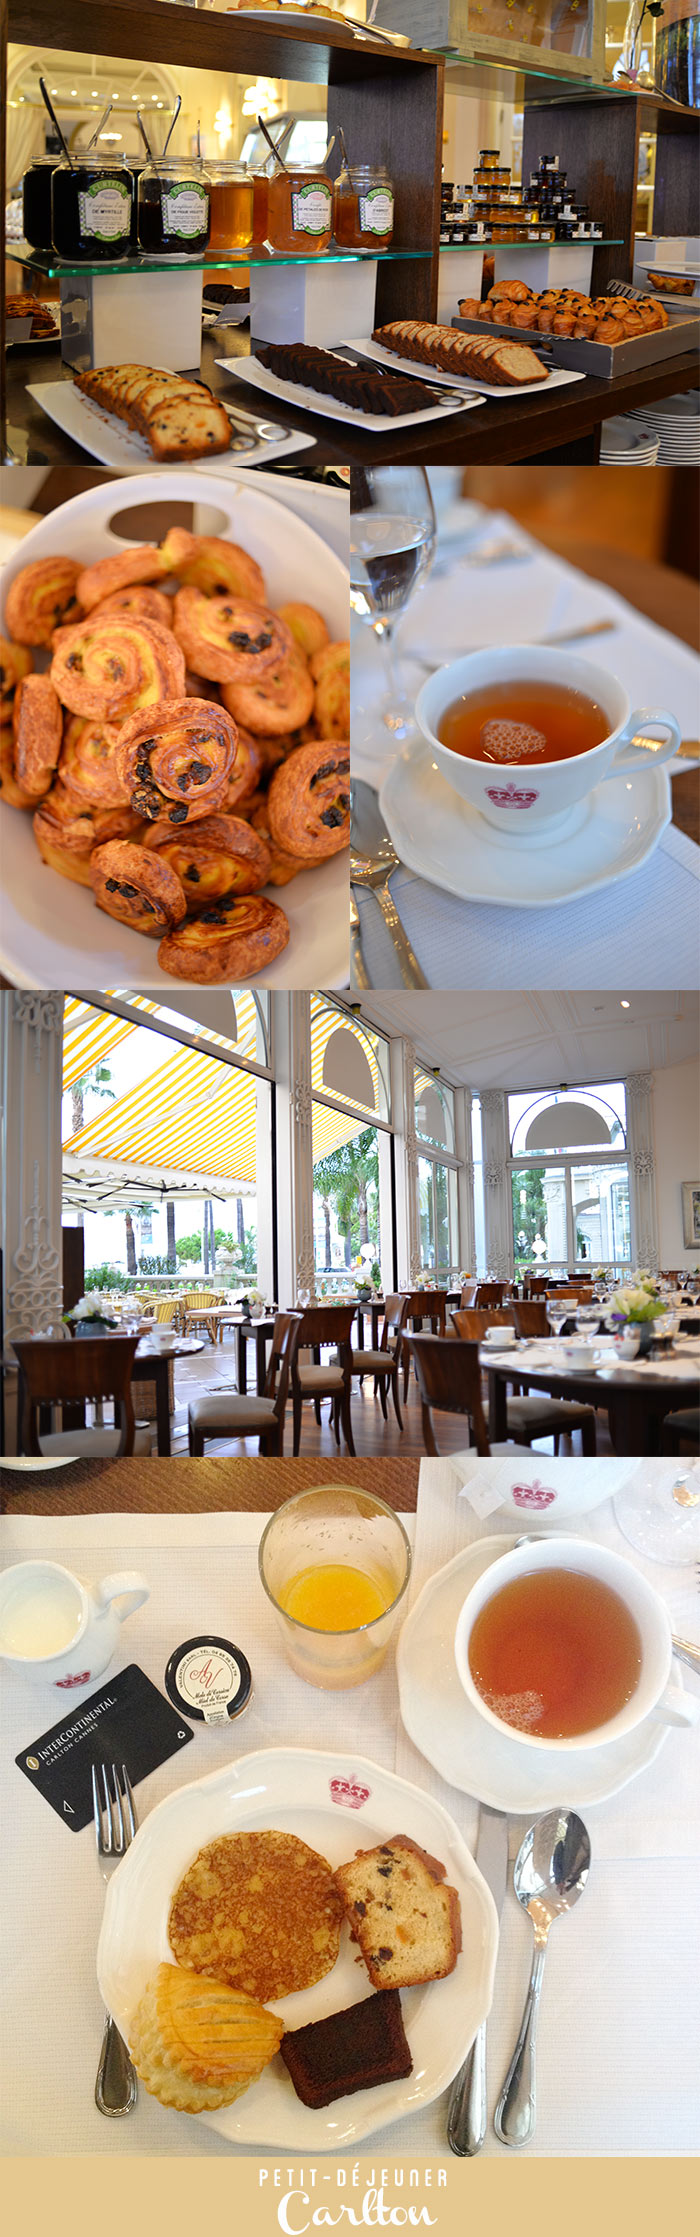 Petit déjeuner InterContinental Cannes